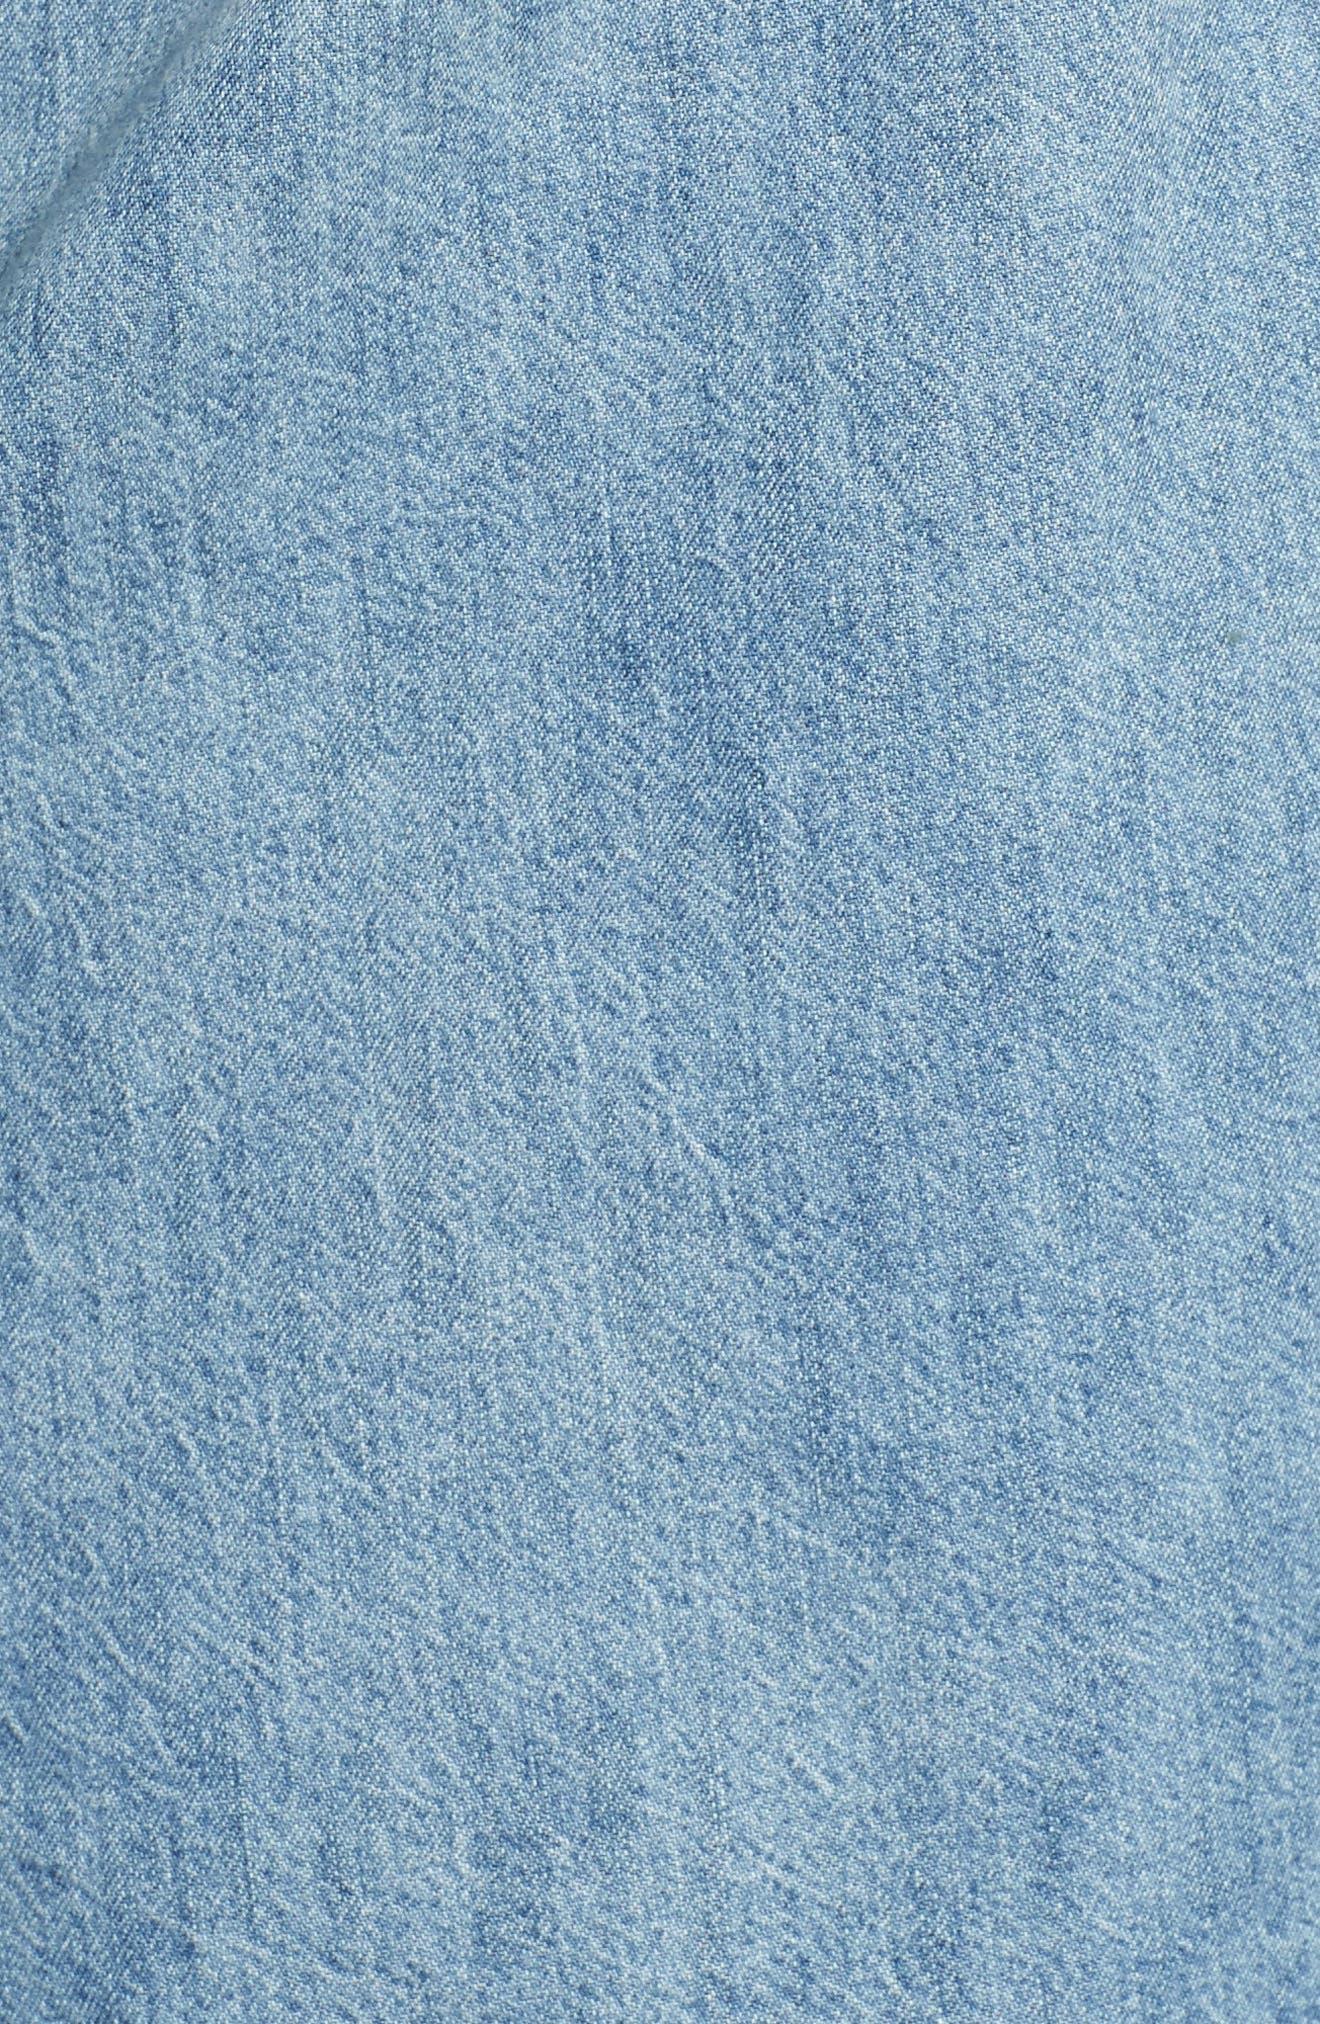 LUCKY BRAND,                             Chambray Boyfriend Shirt,                             Alternate thumbnail 5, color,                             440